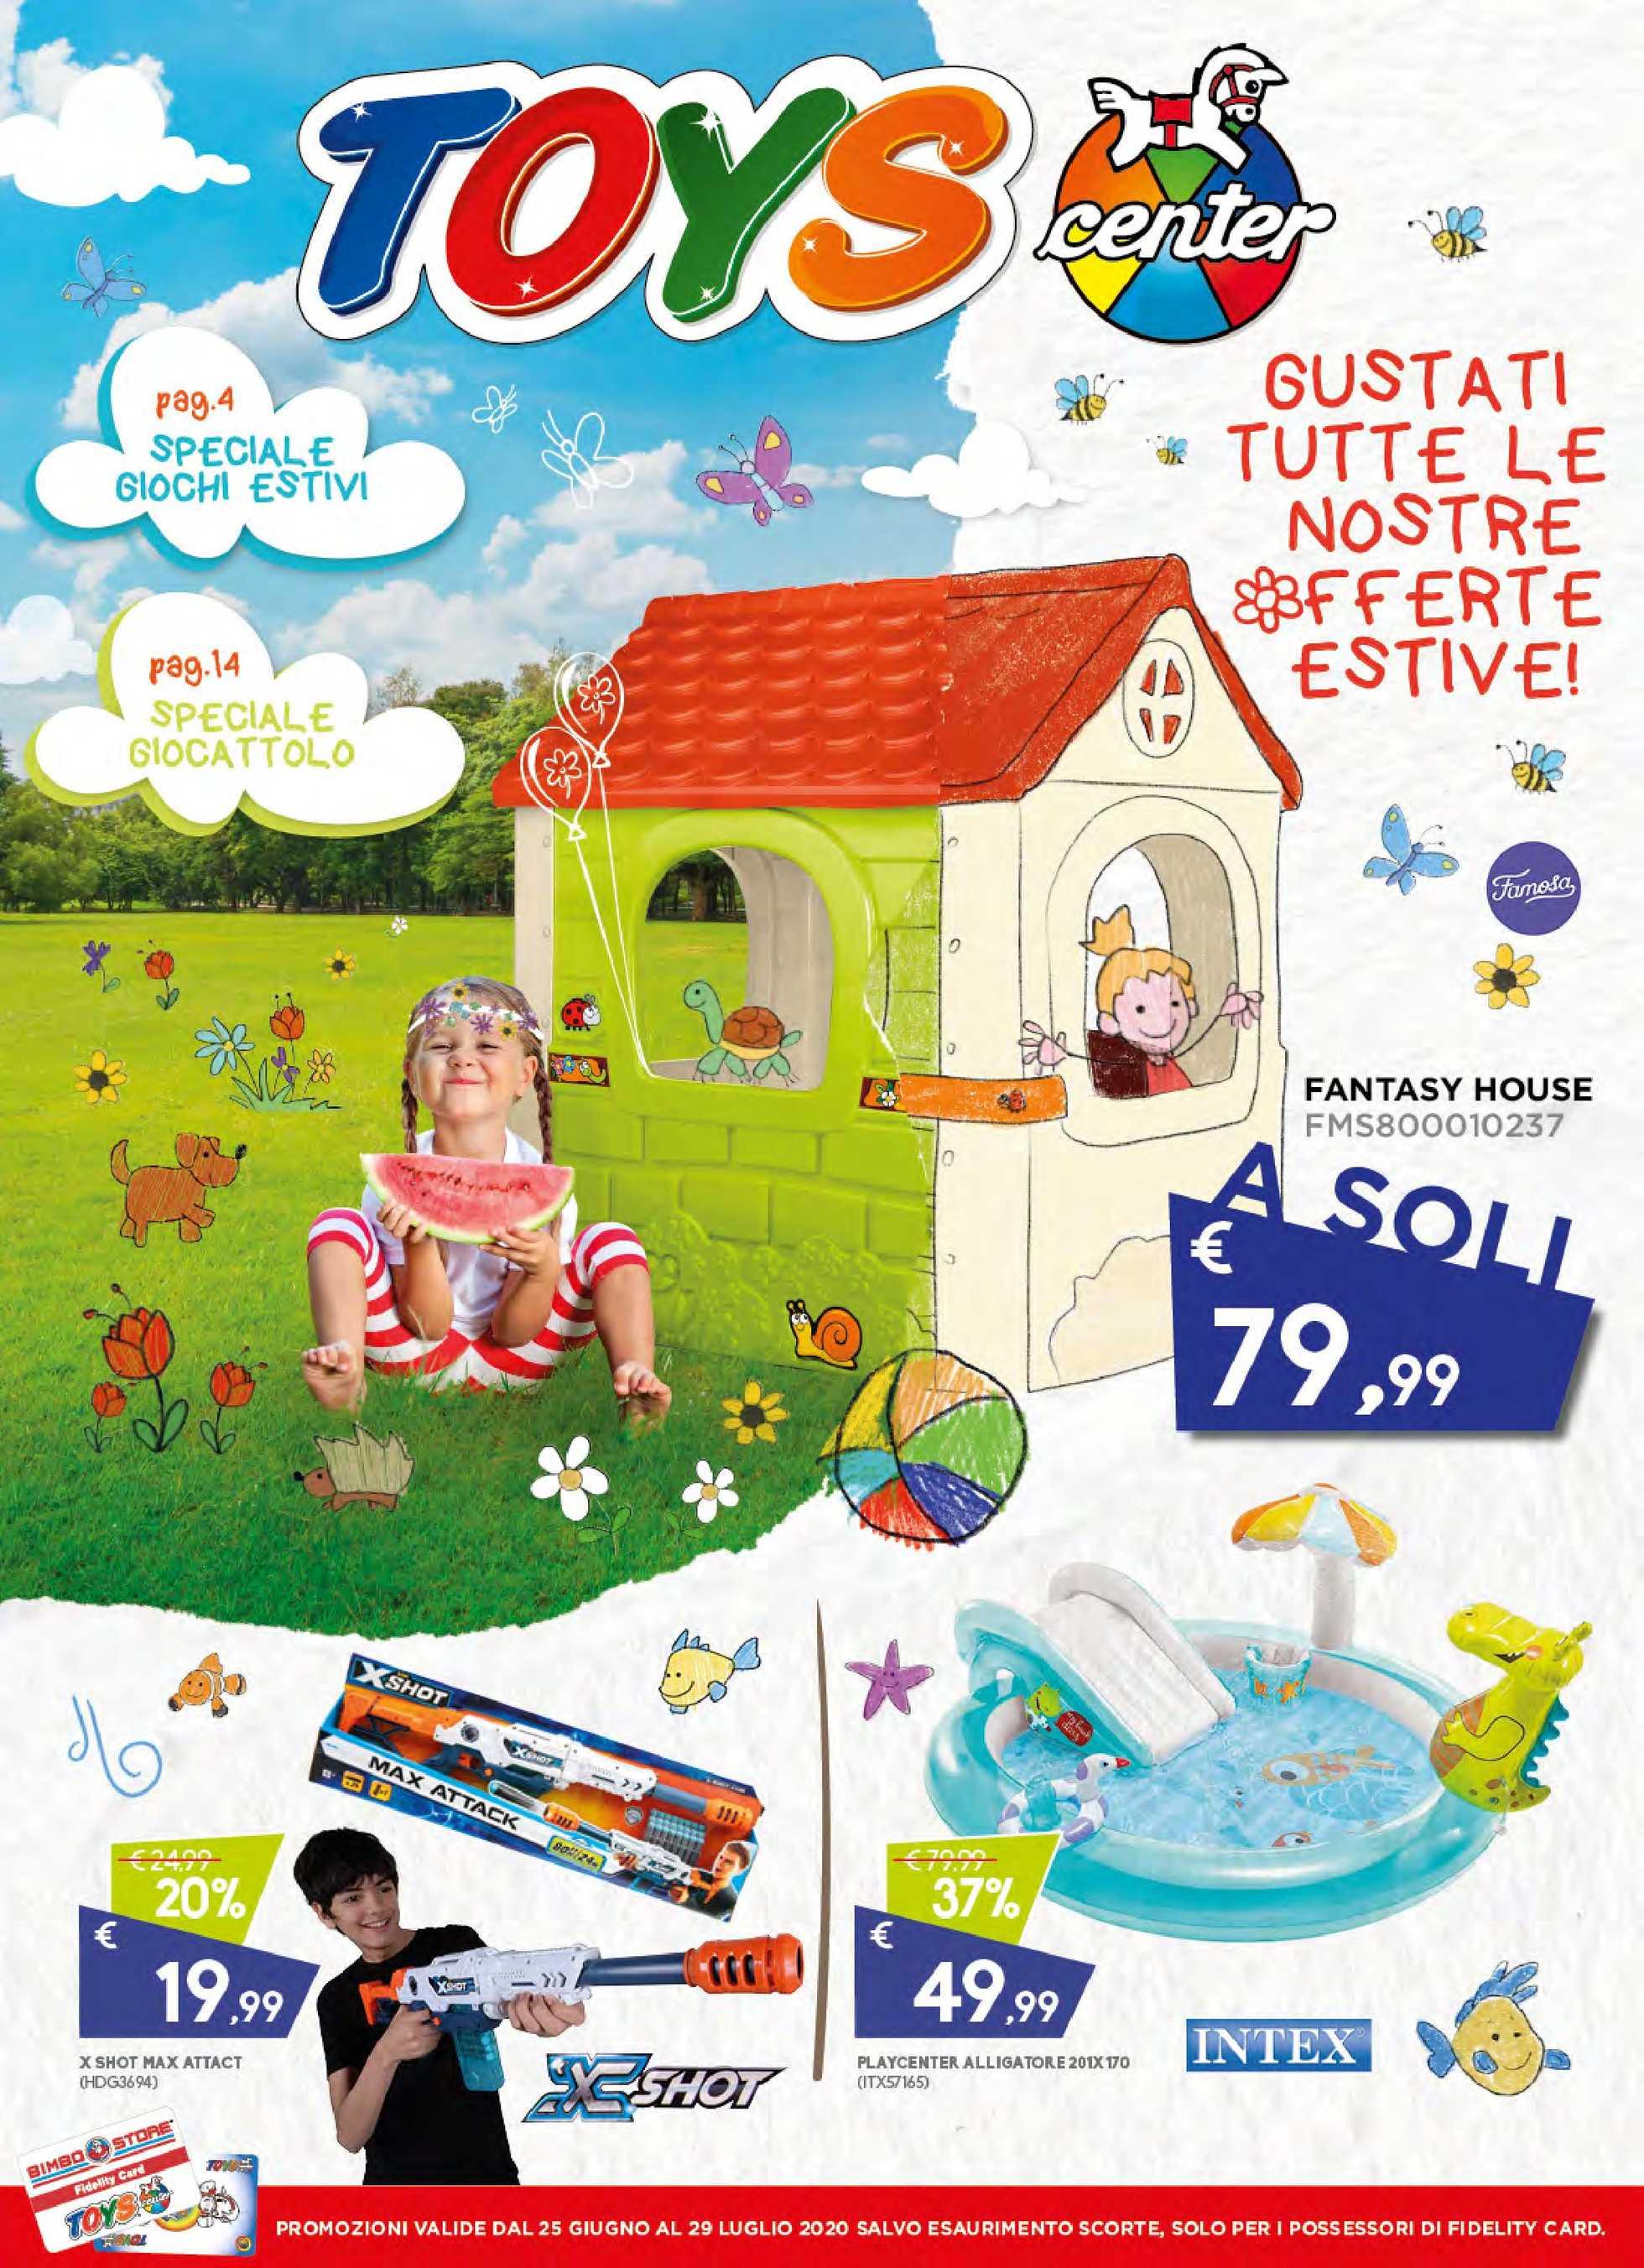 Toys Center - offerte valide dal 25.06.2020 al 29.07.2020 - pagina 1.